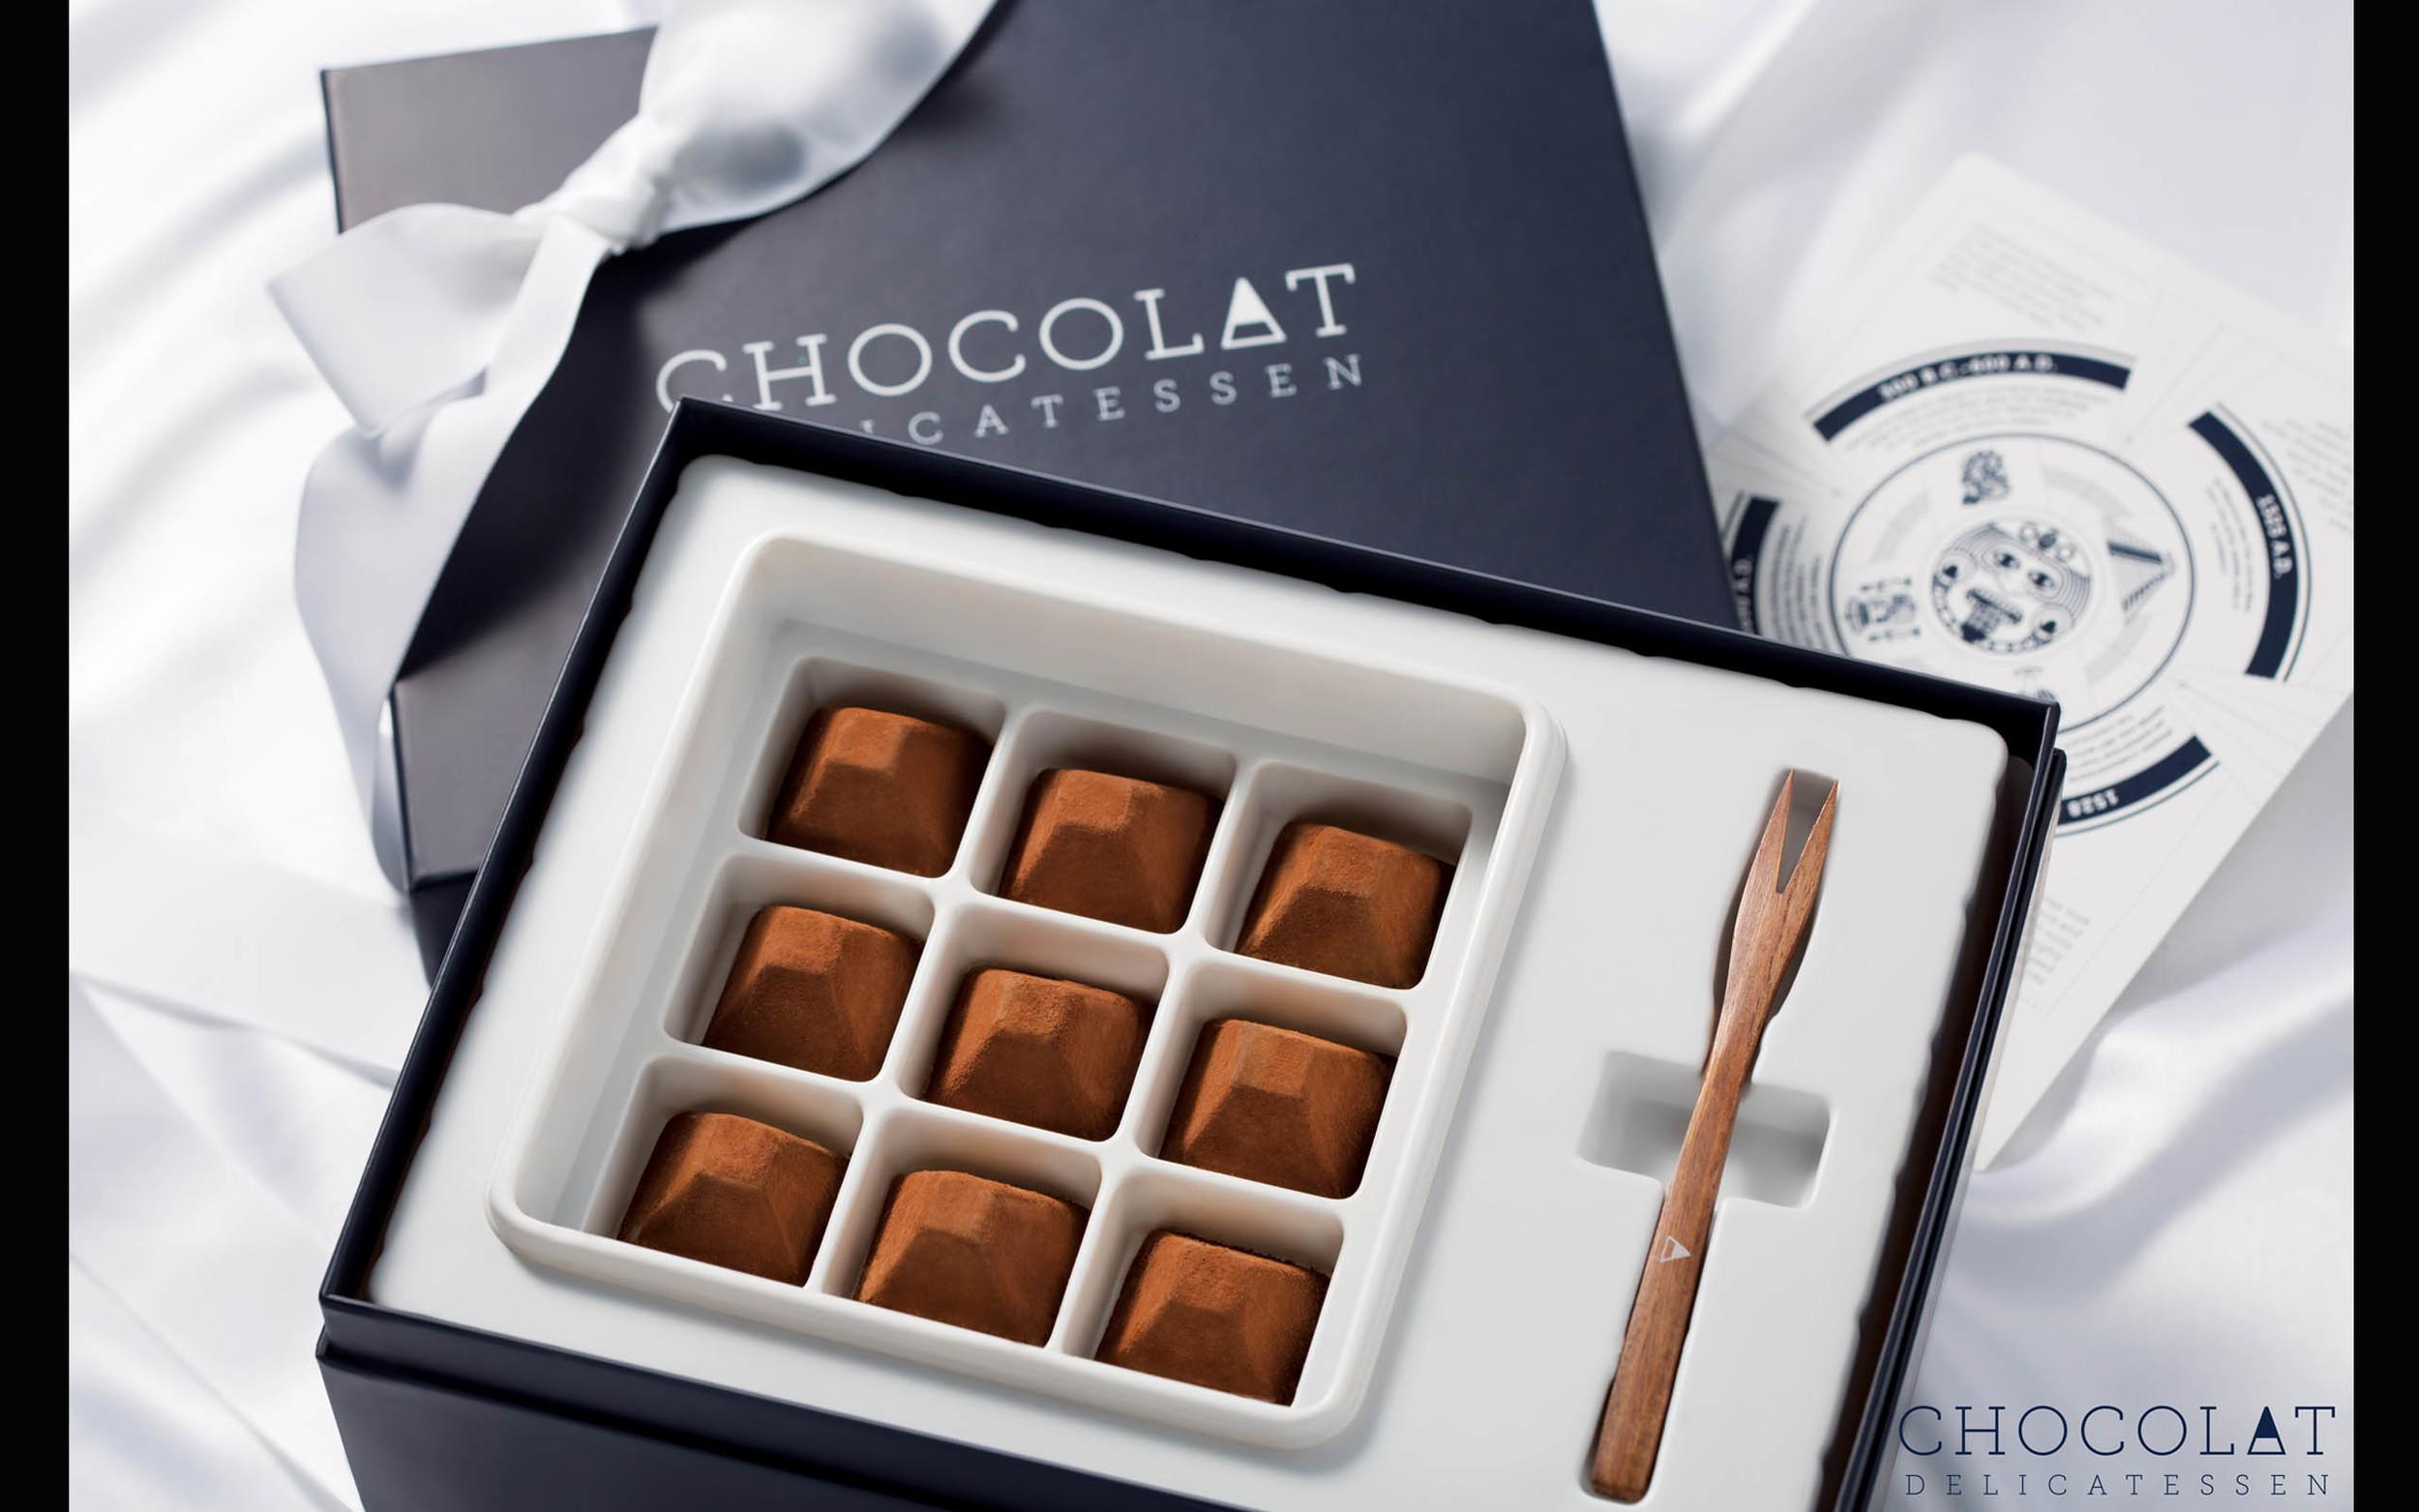 Chocolat Delicatessen By Nordic Kandie